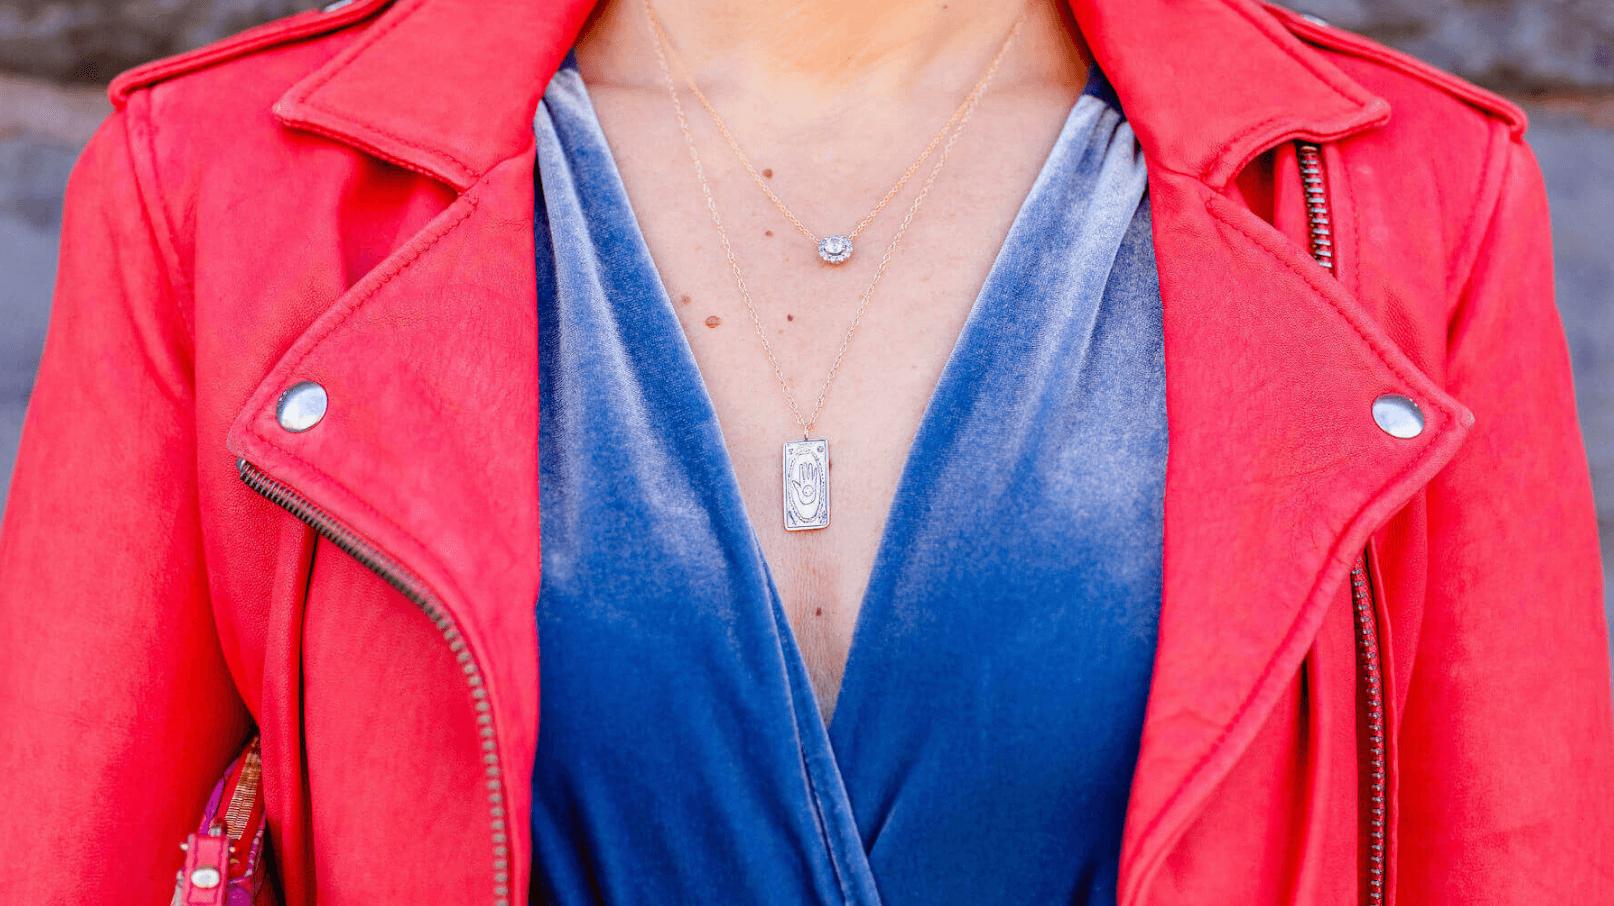 IRO Leather Jacket Misa Dress Coclico Booties Sofia Zakia Necklace Look by Modnitsa Styling